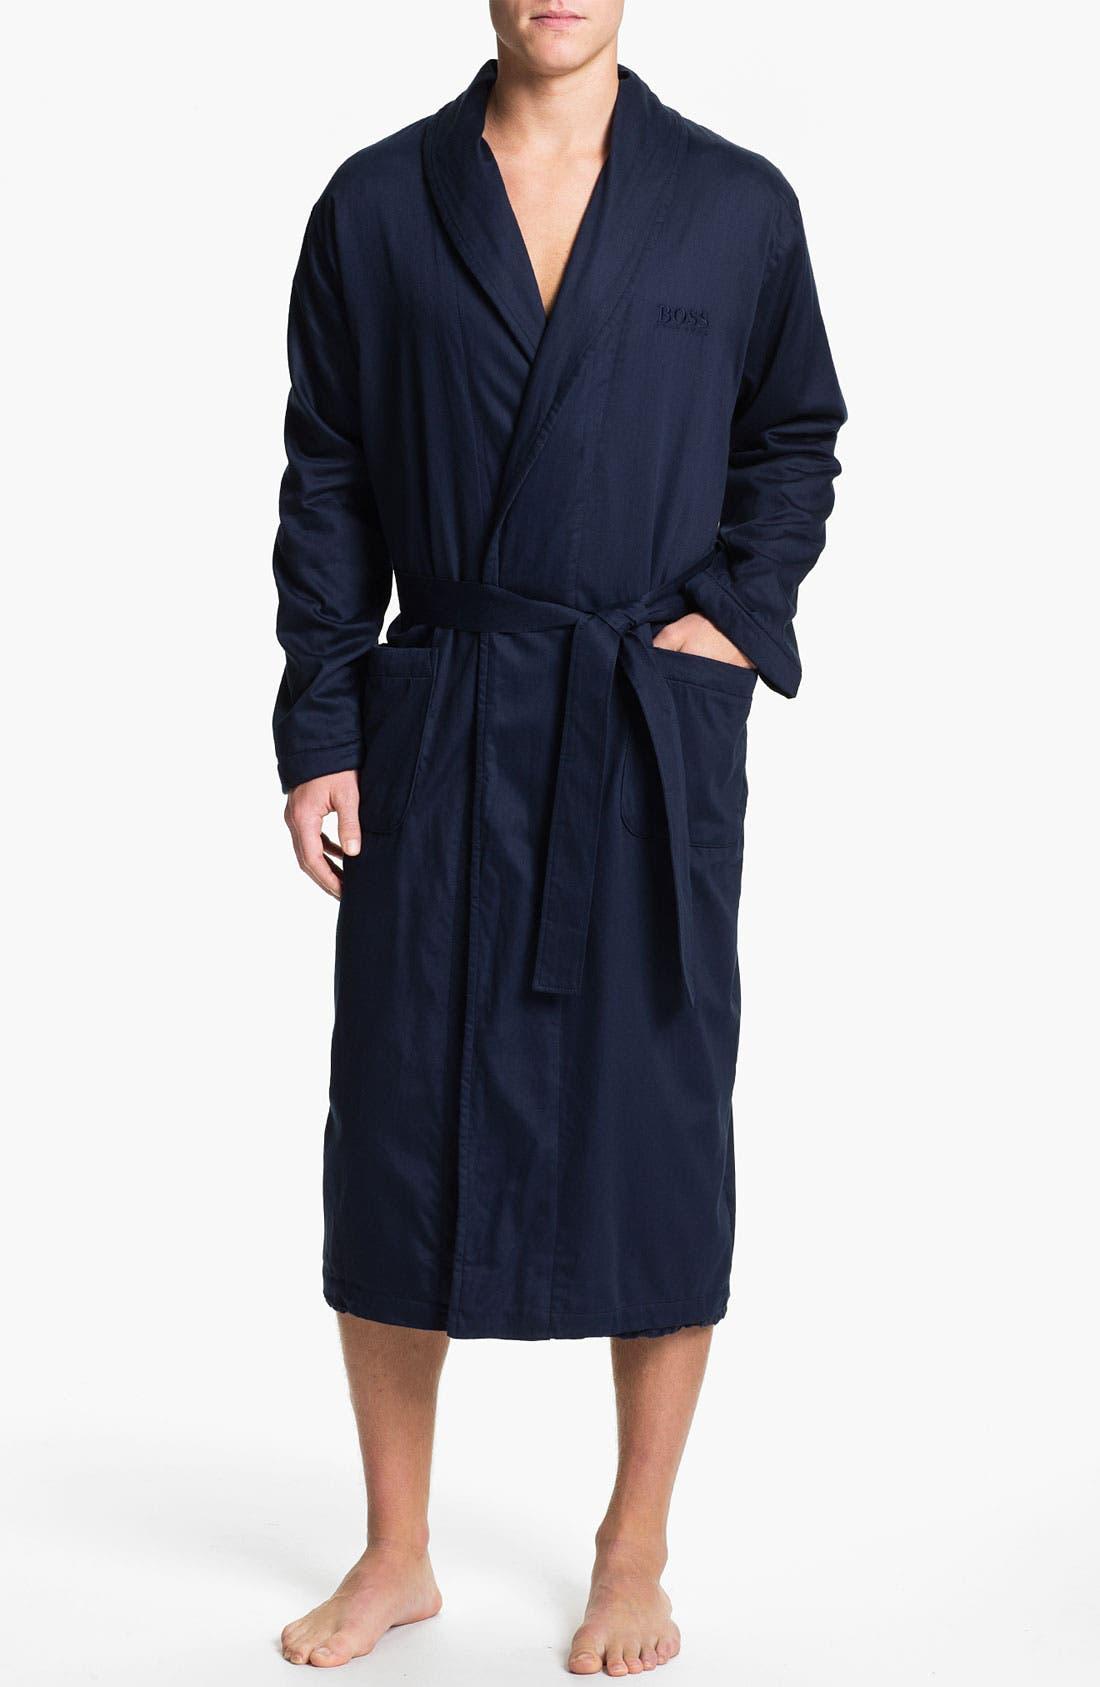 Alternate Image 1 Selected - BOSS Black Shawl Collar 'Innovation 6' Robe